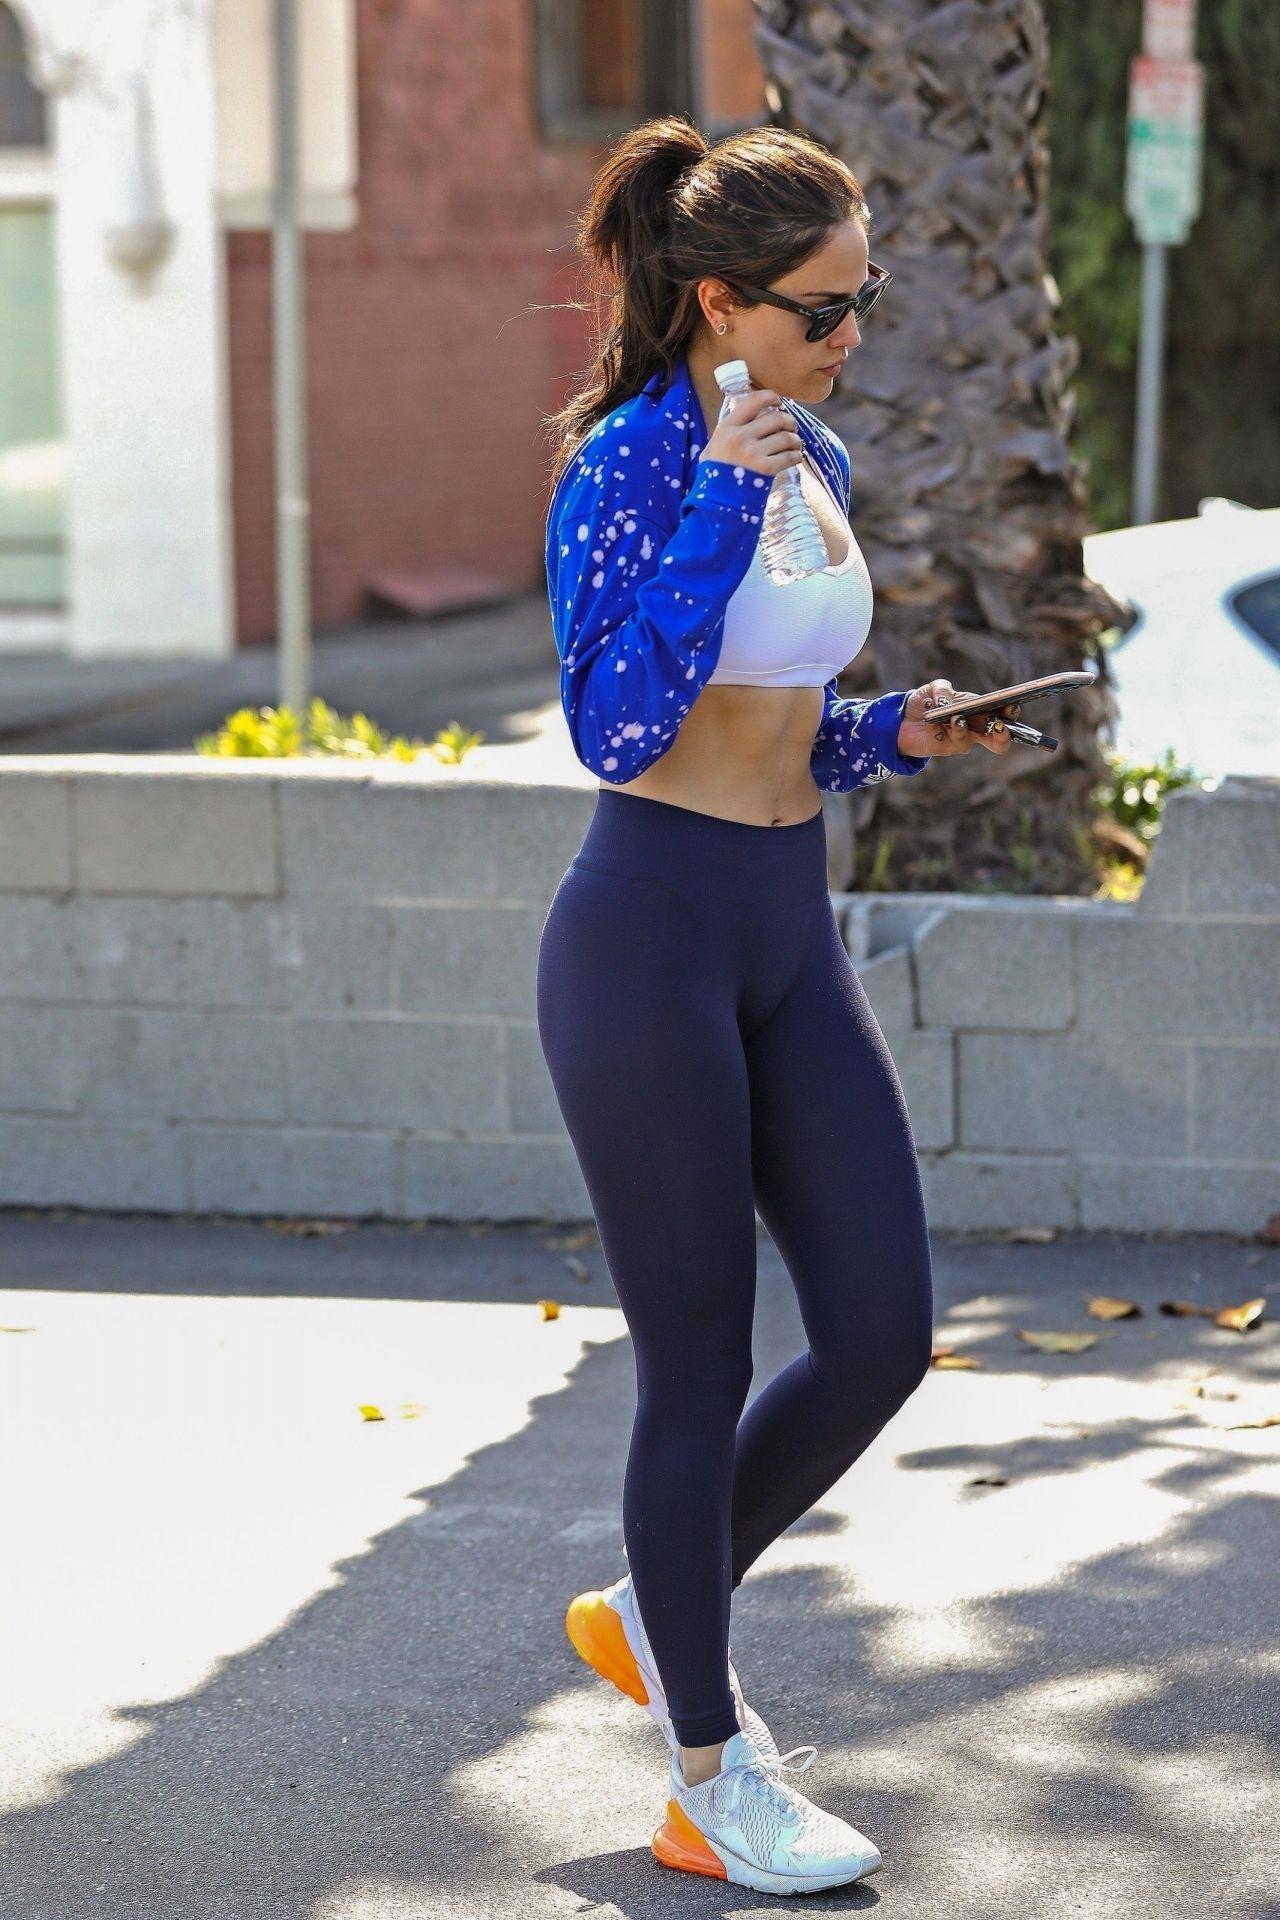 eiza gonzalez in workout gear  28  2018